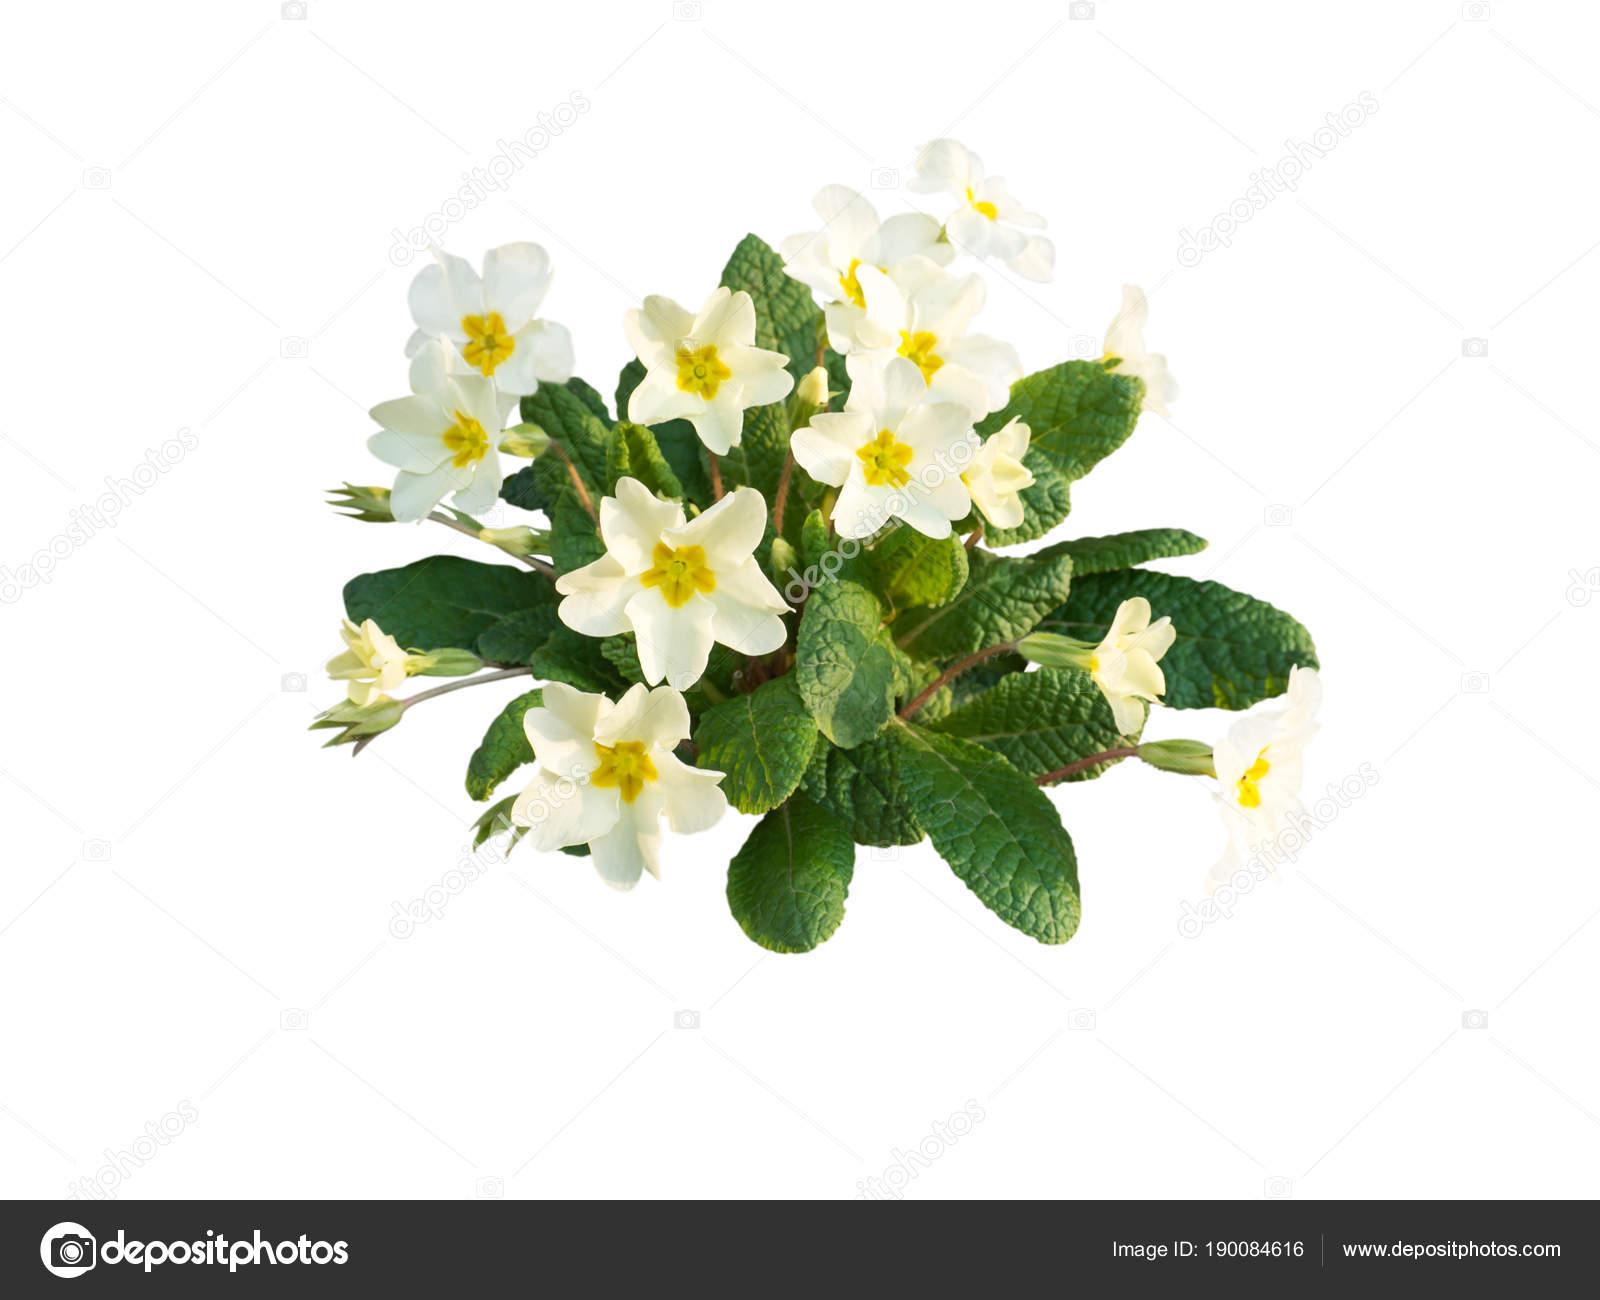 Primula vulgaris pale yellow flowers stock photo photohampster primula vulgaris pale yellow flowers stock photo mightylinksfo